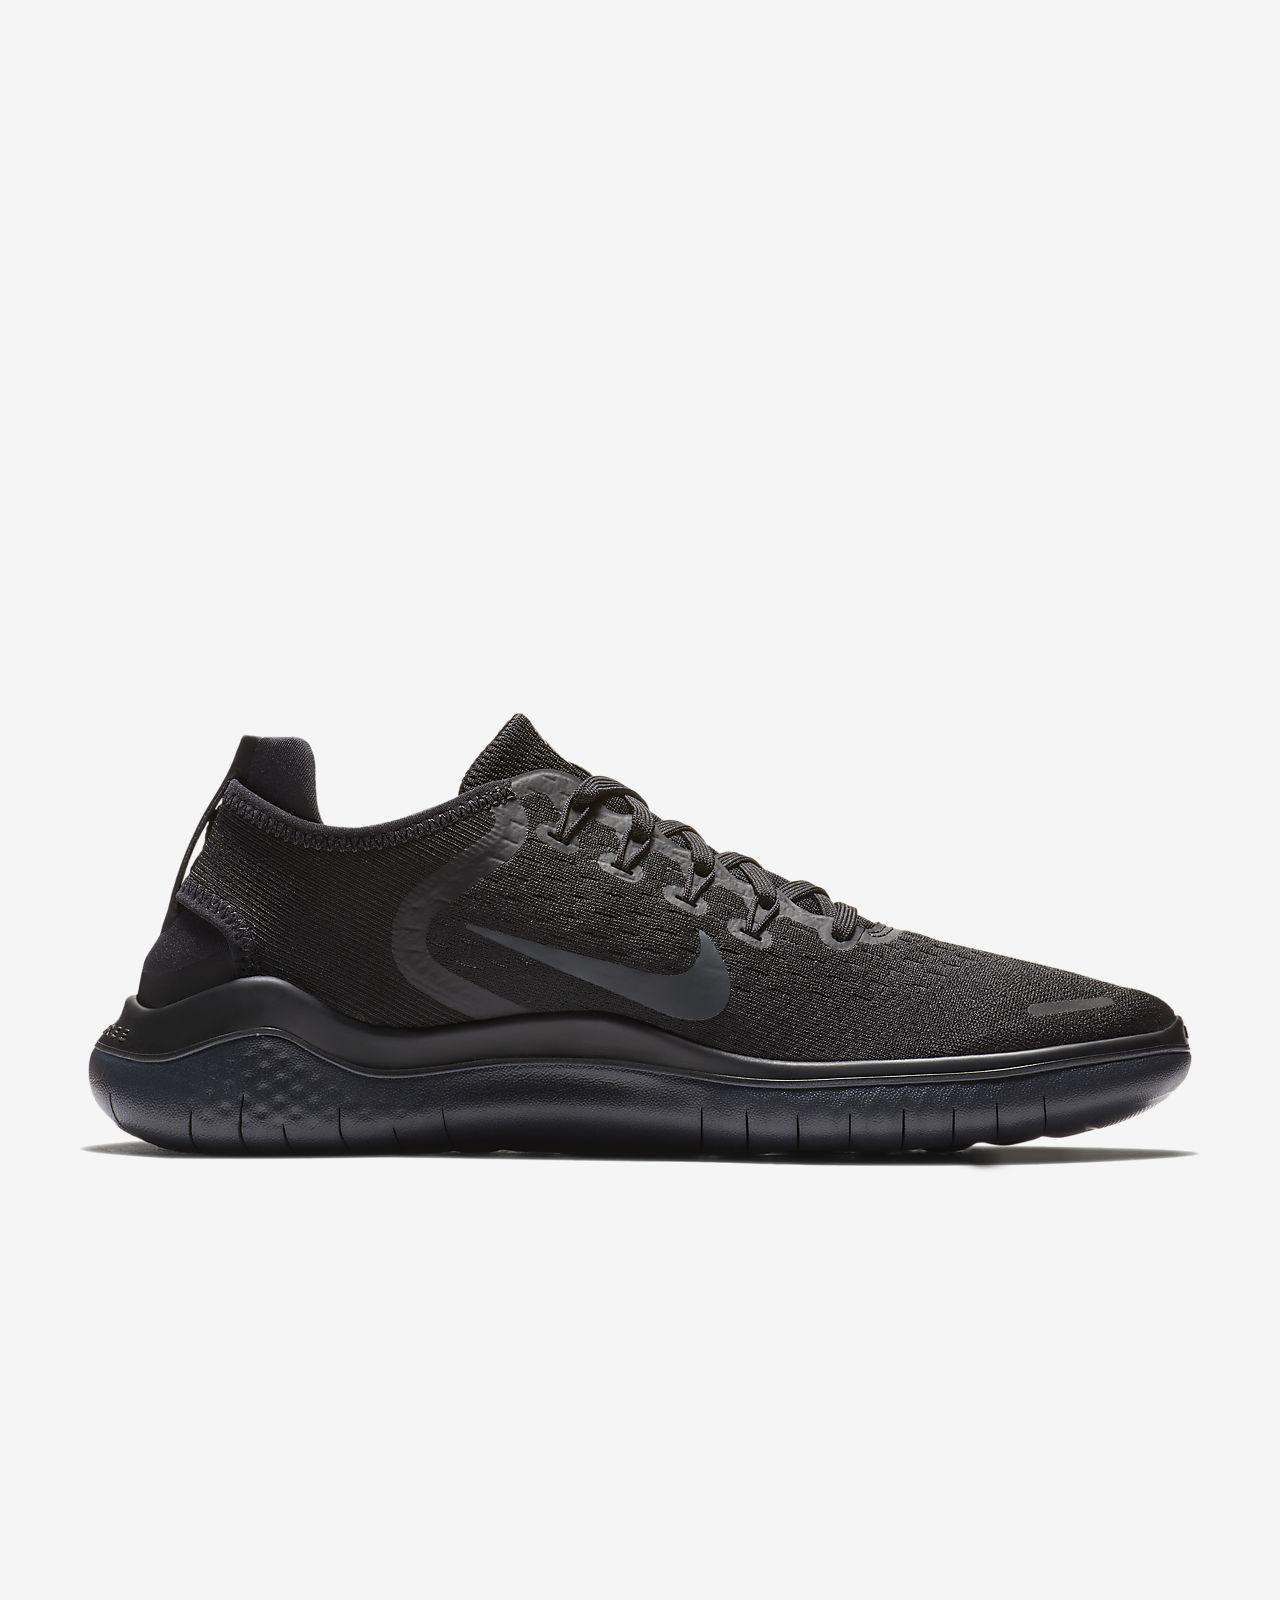 25b5ea7433c86 Nike Free RN 2018 Men's Running Shoe. Nike.com